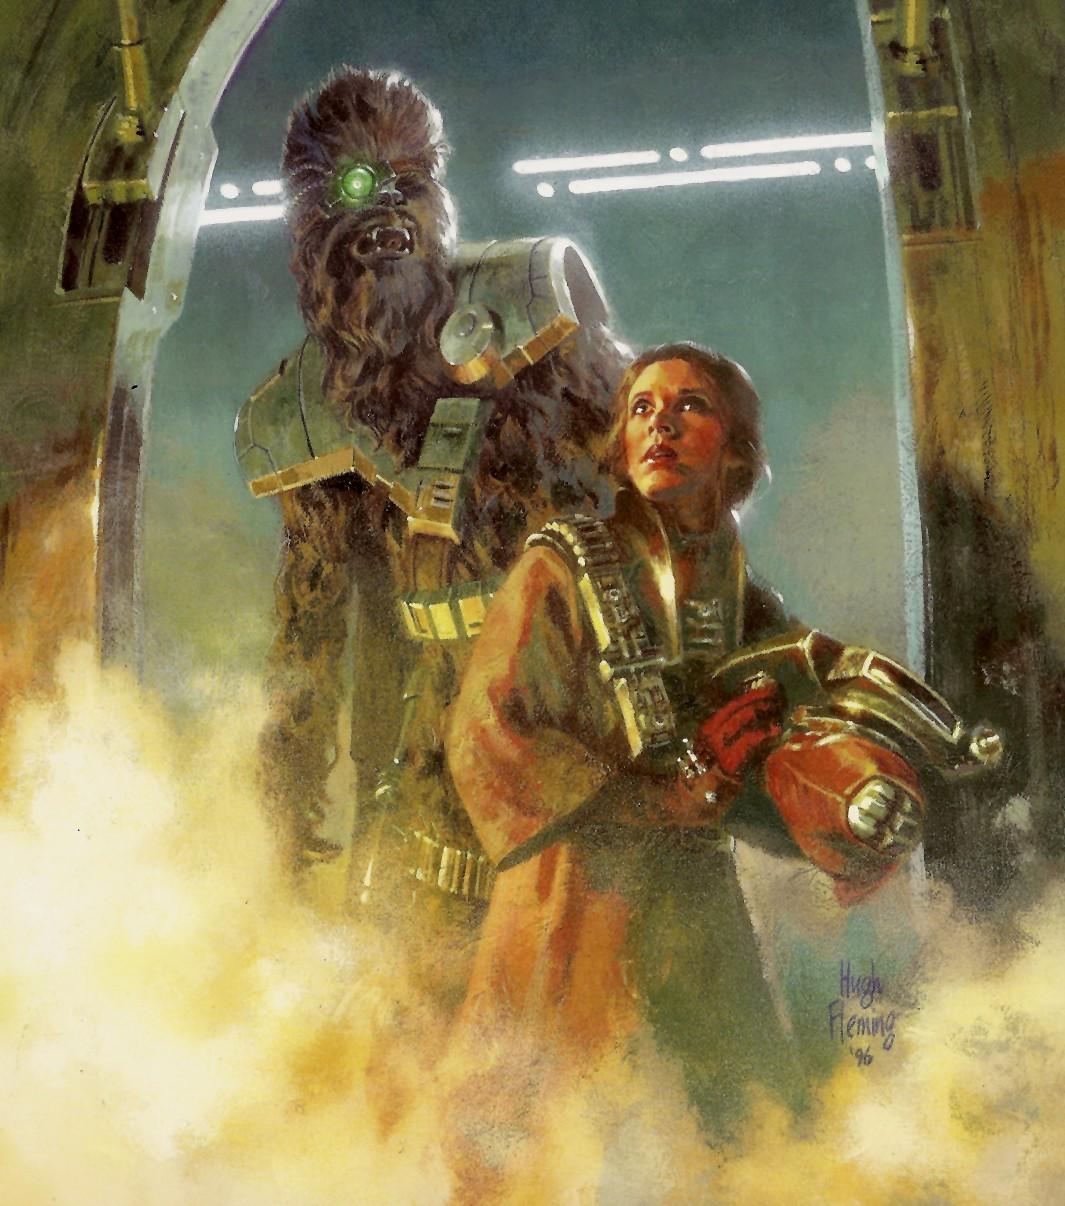 Jabba The Hutt Fucks Princess Leia Stunning poop star wars and lightsabers. woooooo! [archive] - page 3